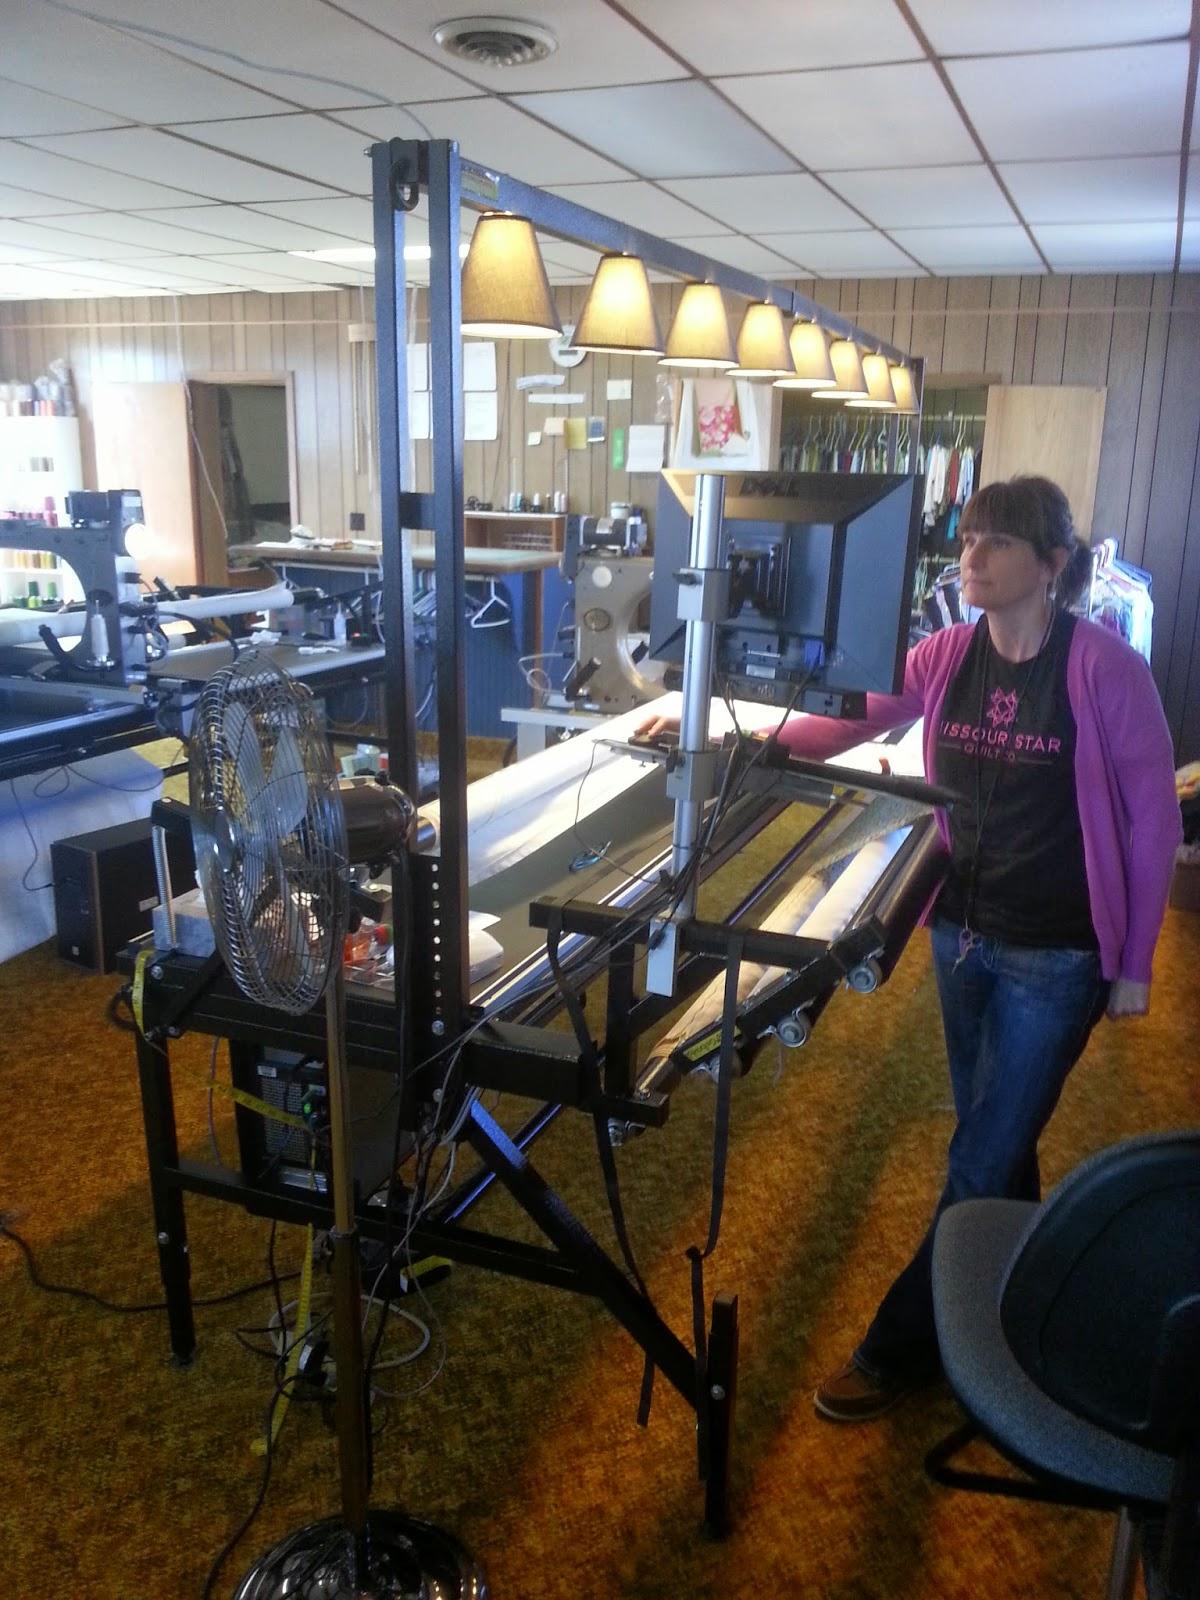 Hillbilly Quilt Shop: A little tour of The Missouri Star Quilt Company : mo star quilt co - Adamdwight.com